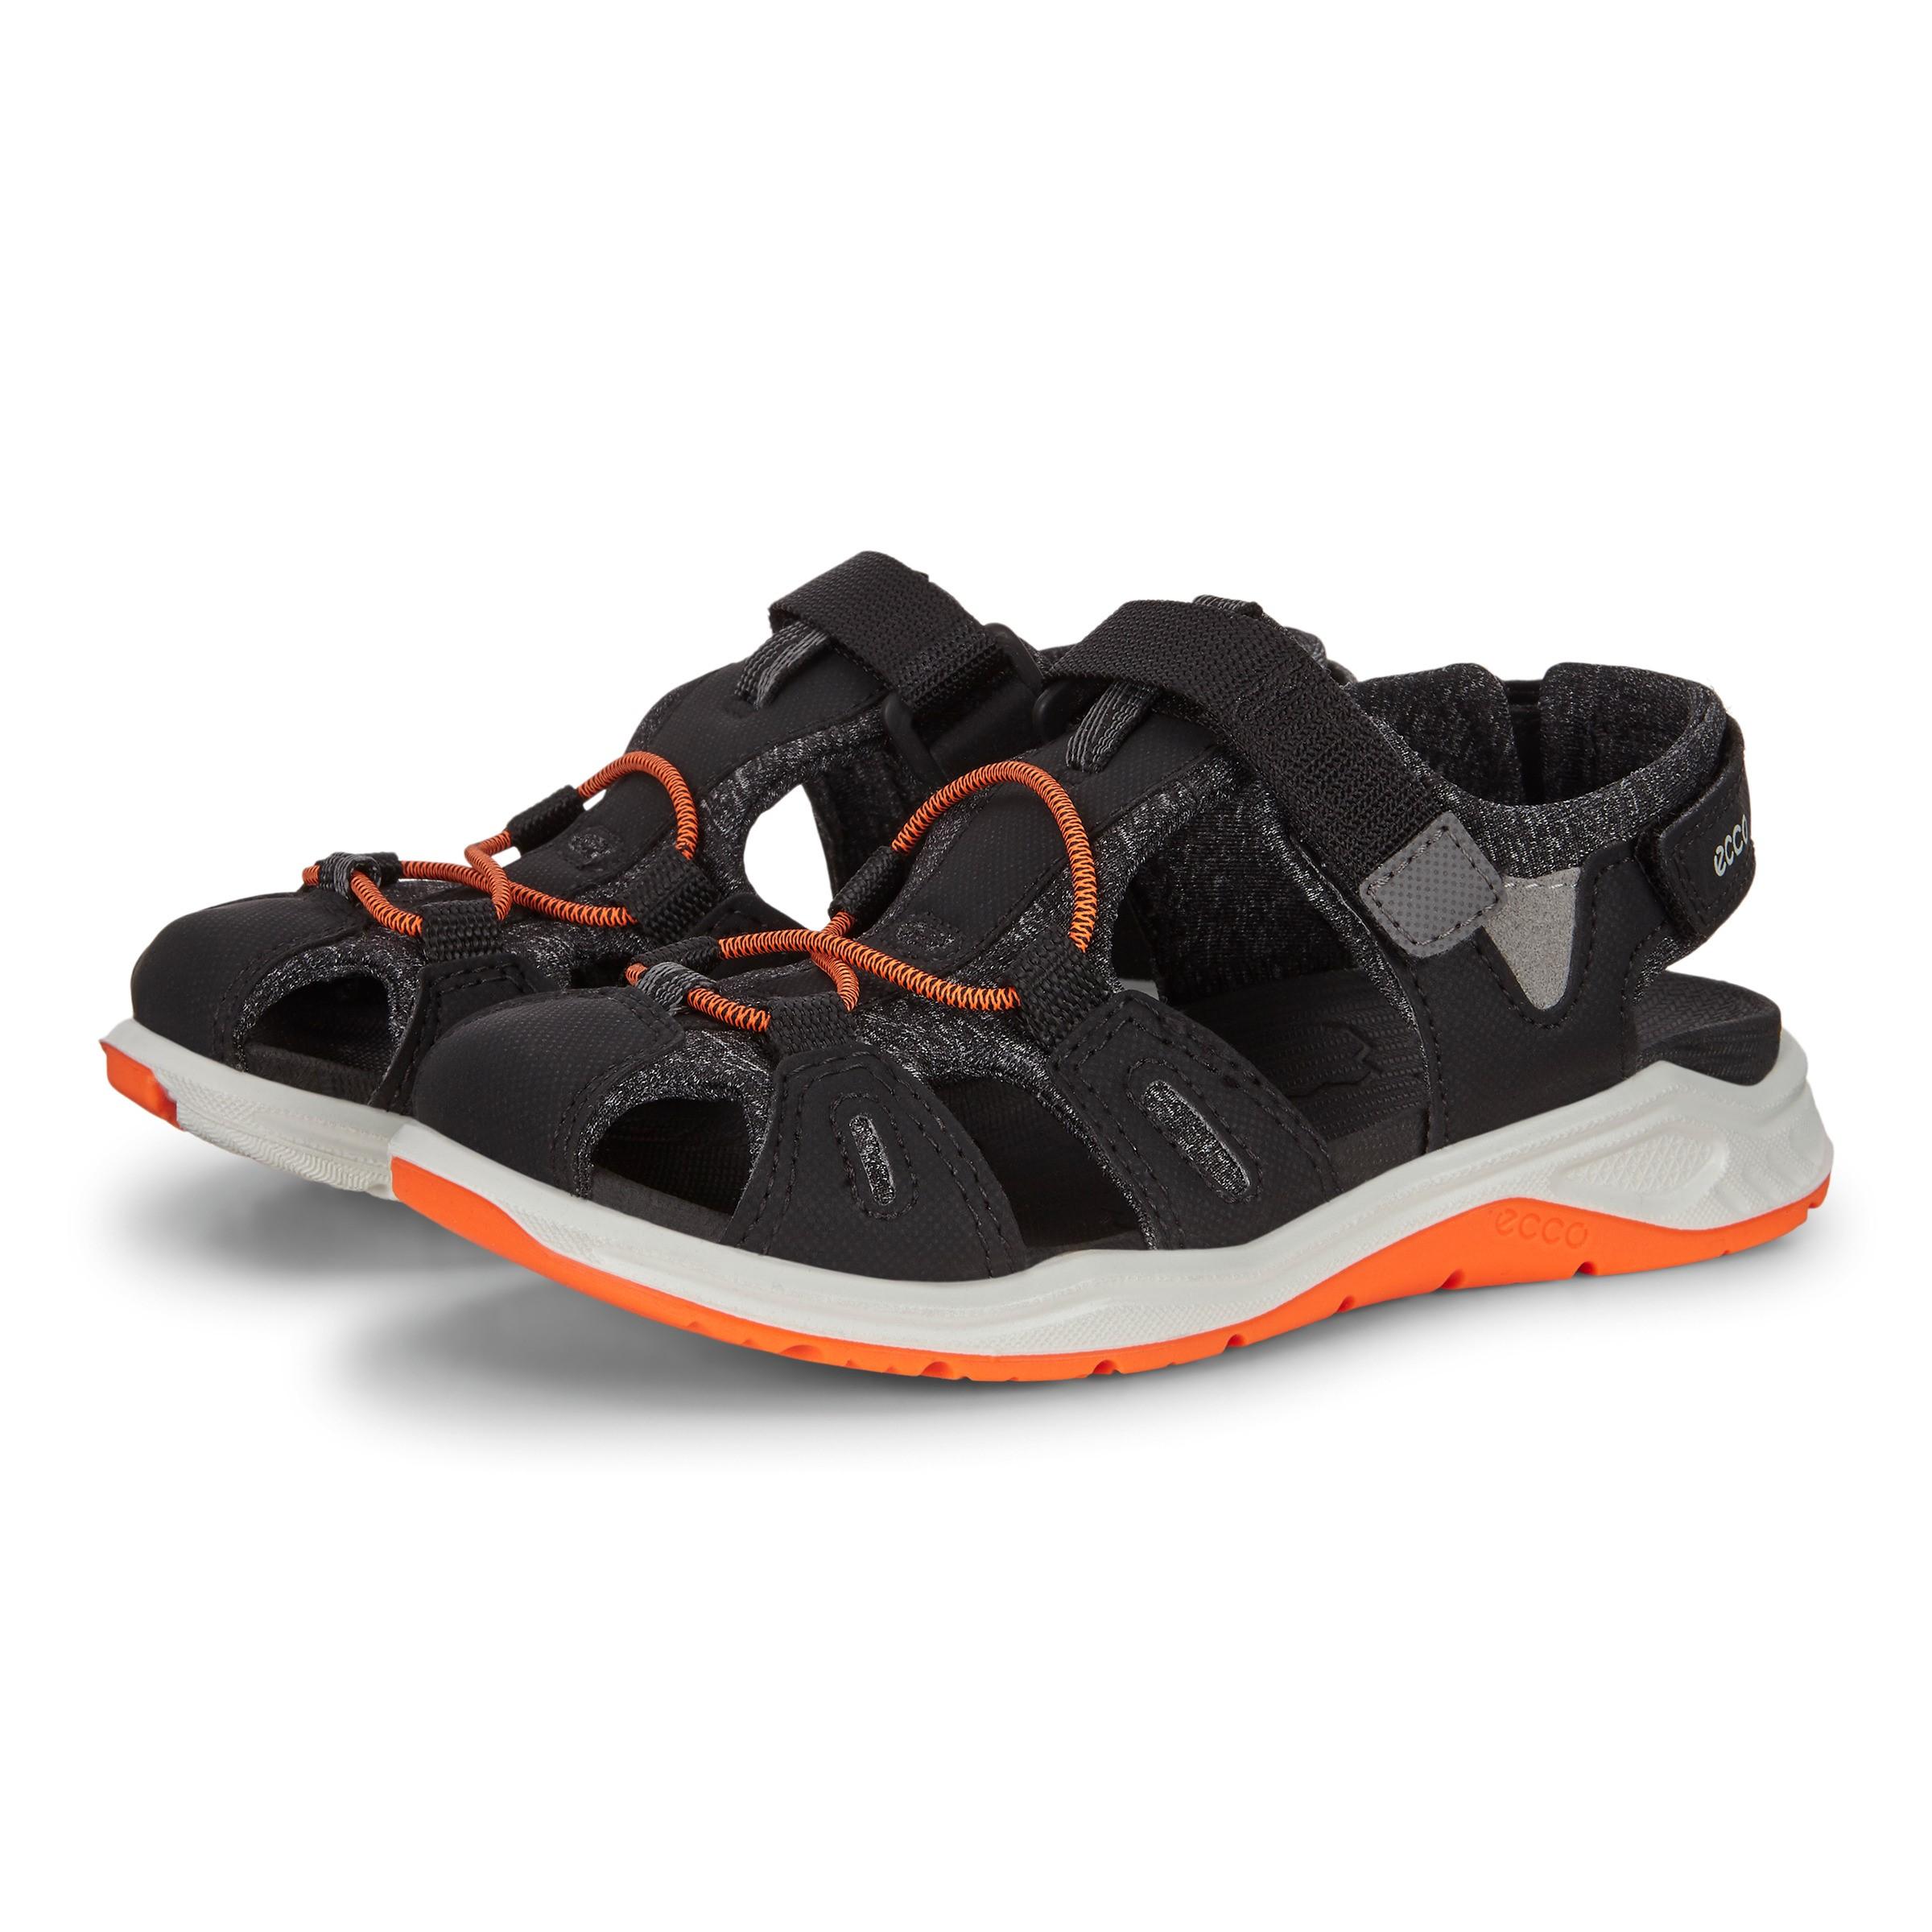 Ecco 710632 sandaler, Sort, 34